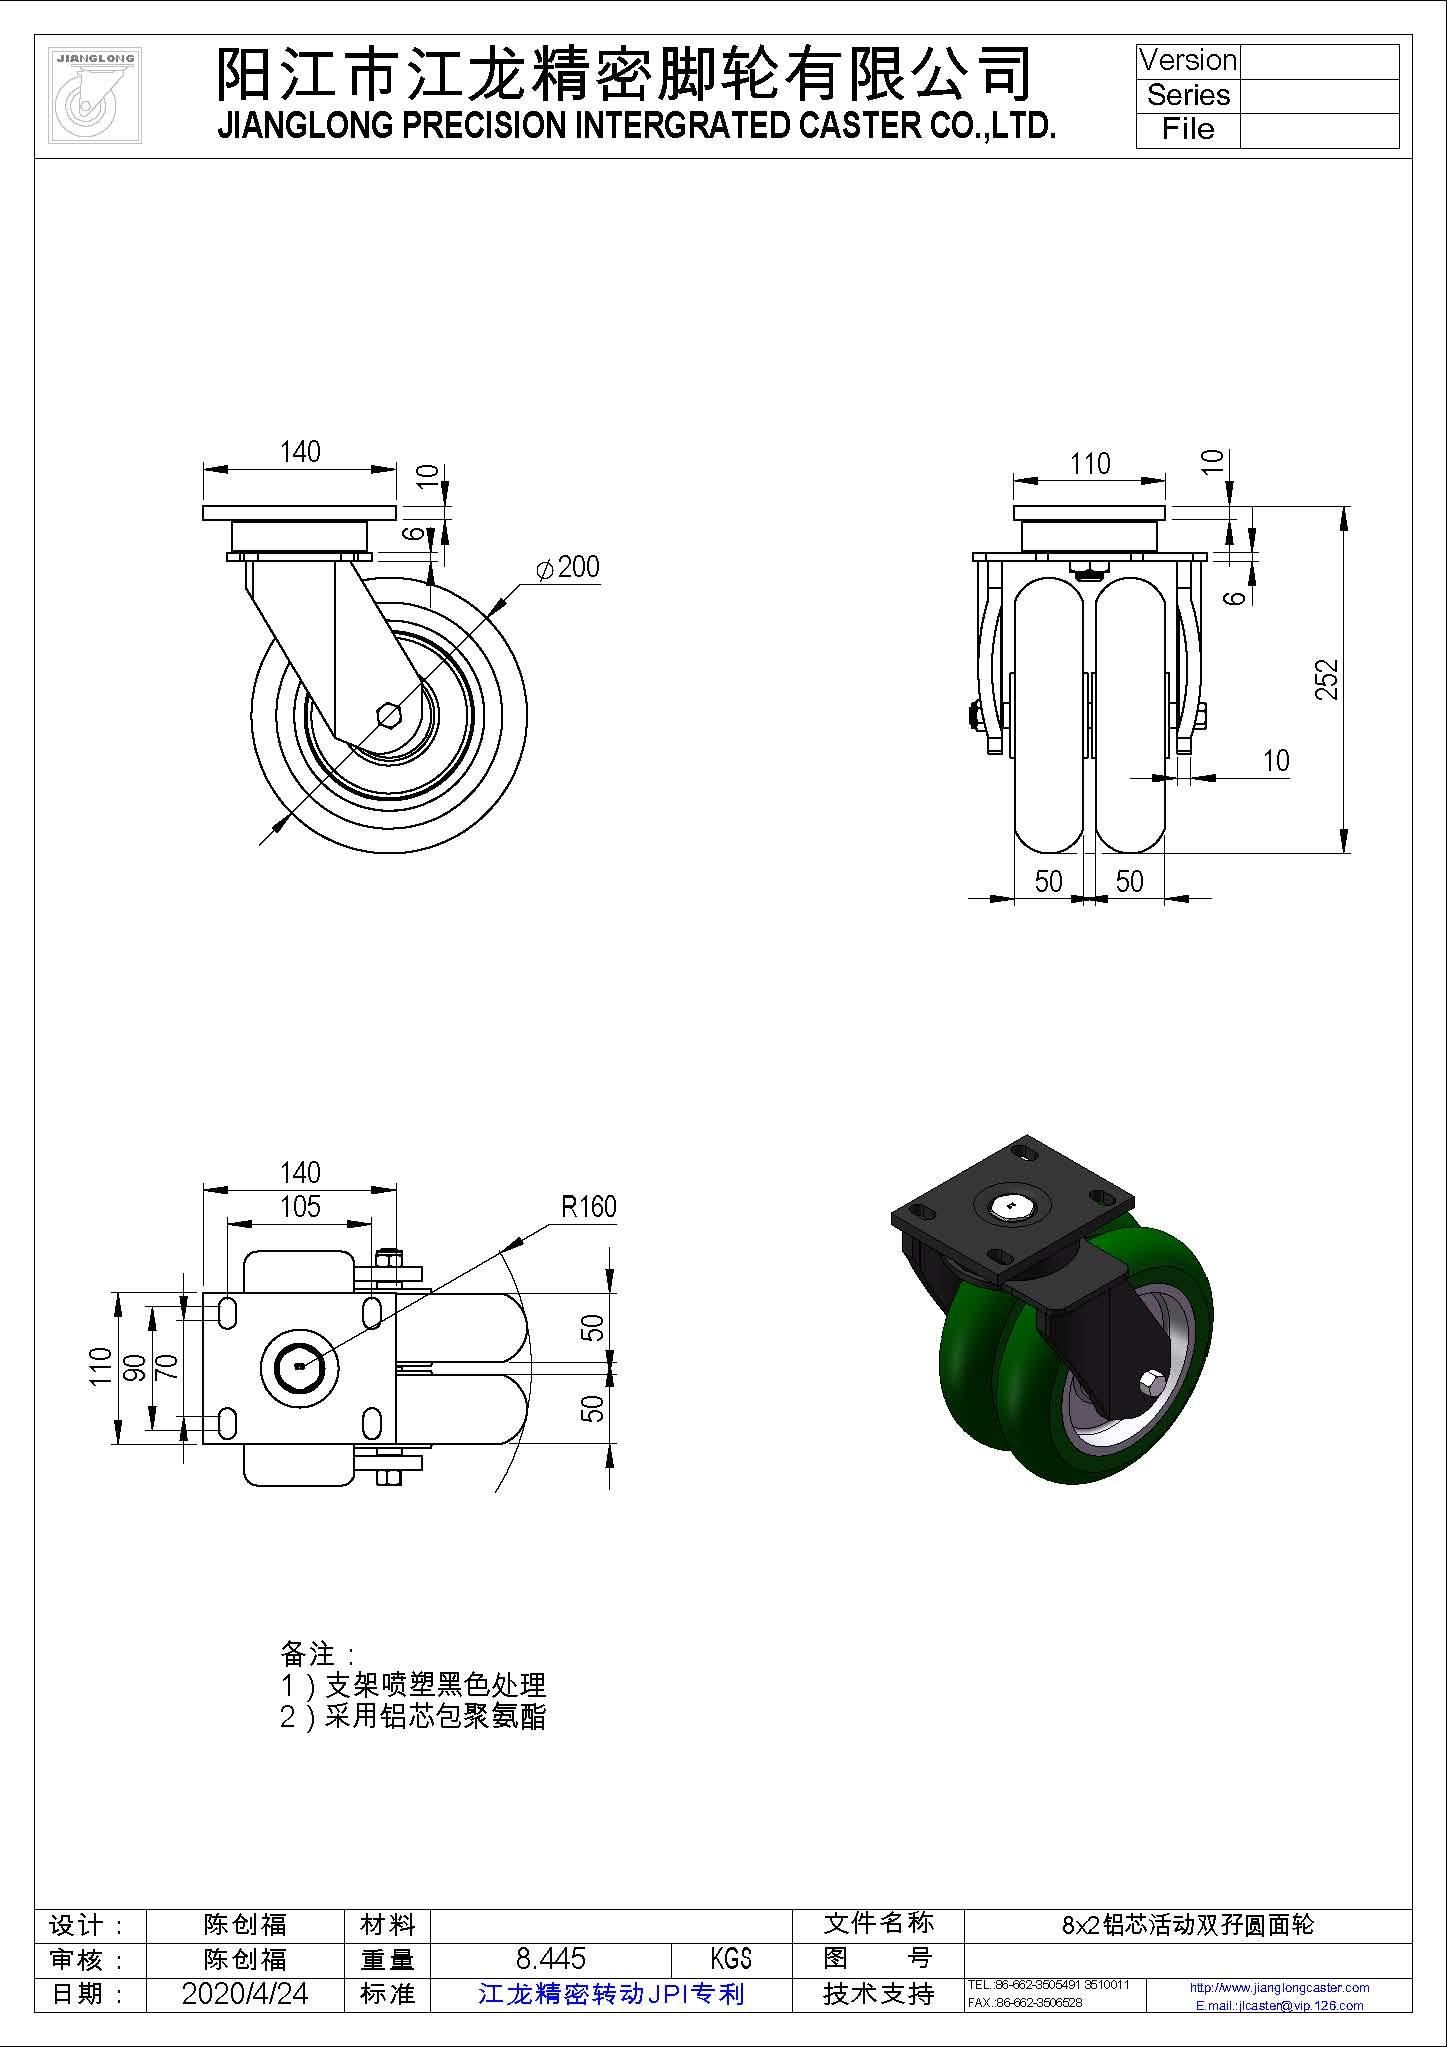 8x2鋁芯活動雙孖圓面輪12.jpg